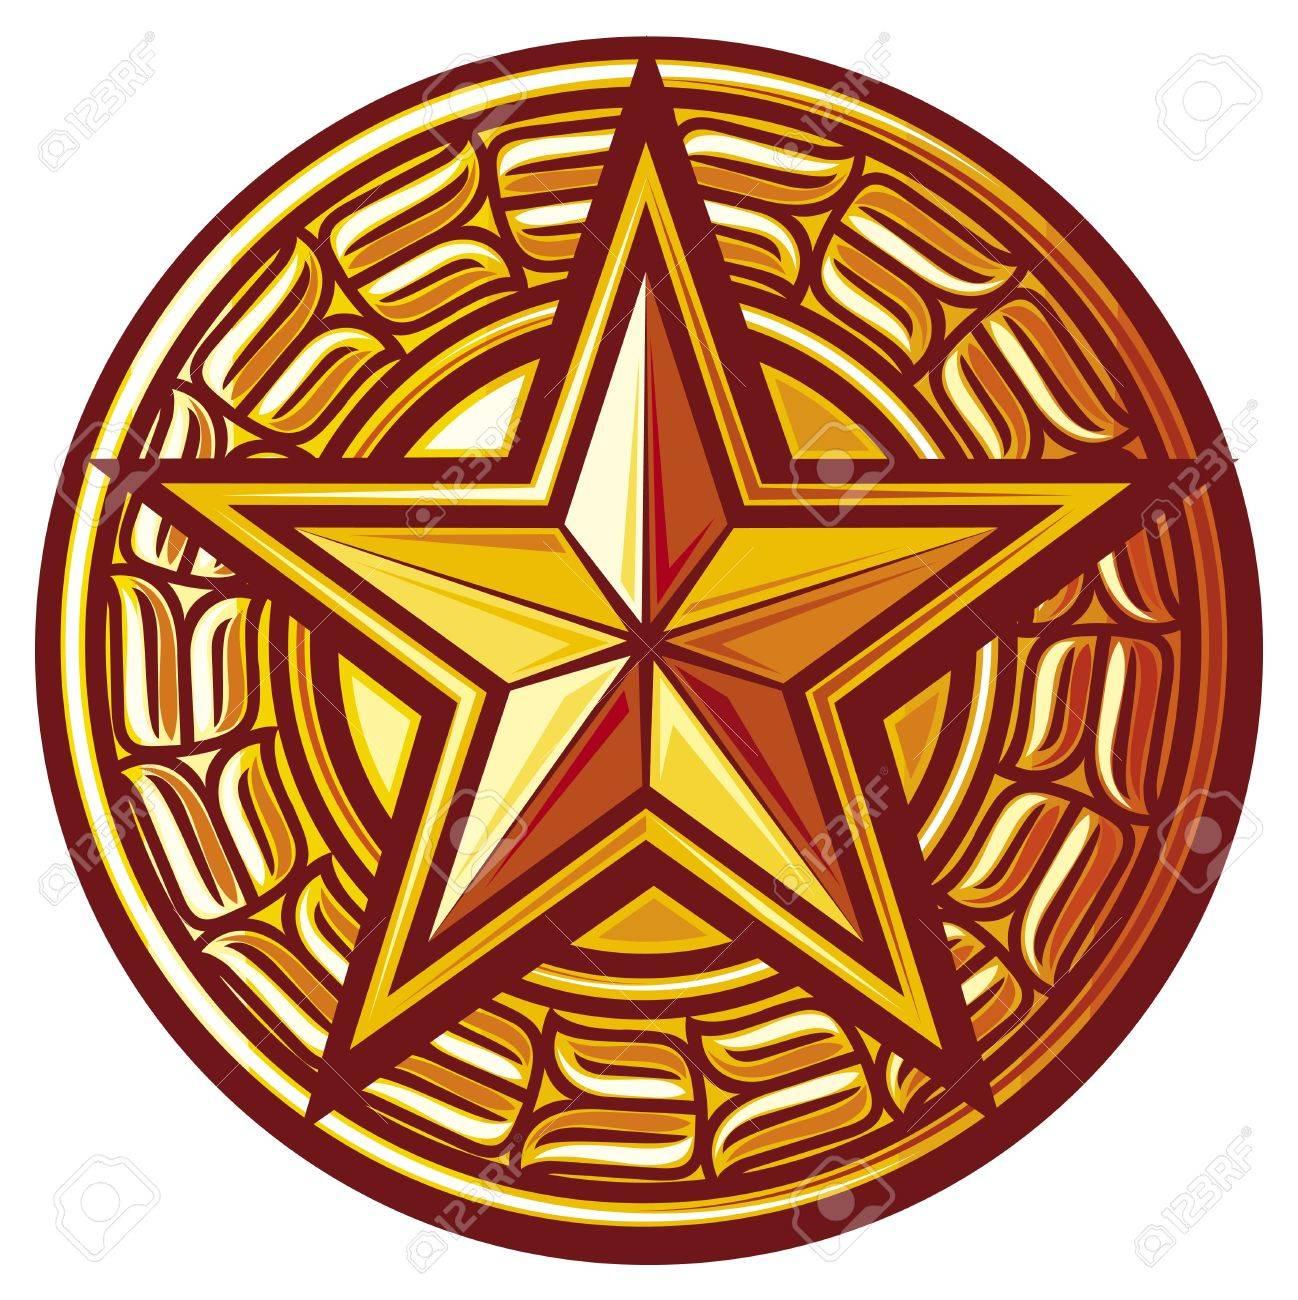 star star seal, sign, symbol, badge - 20192040